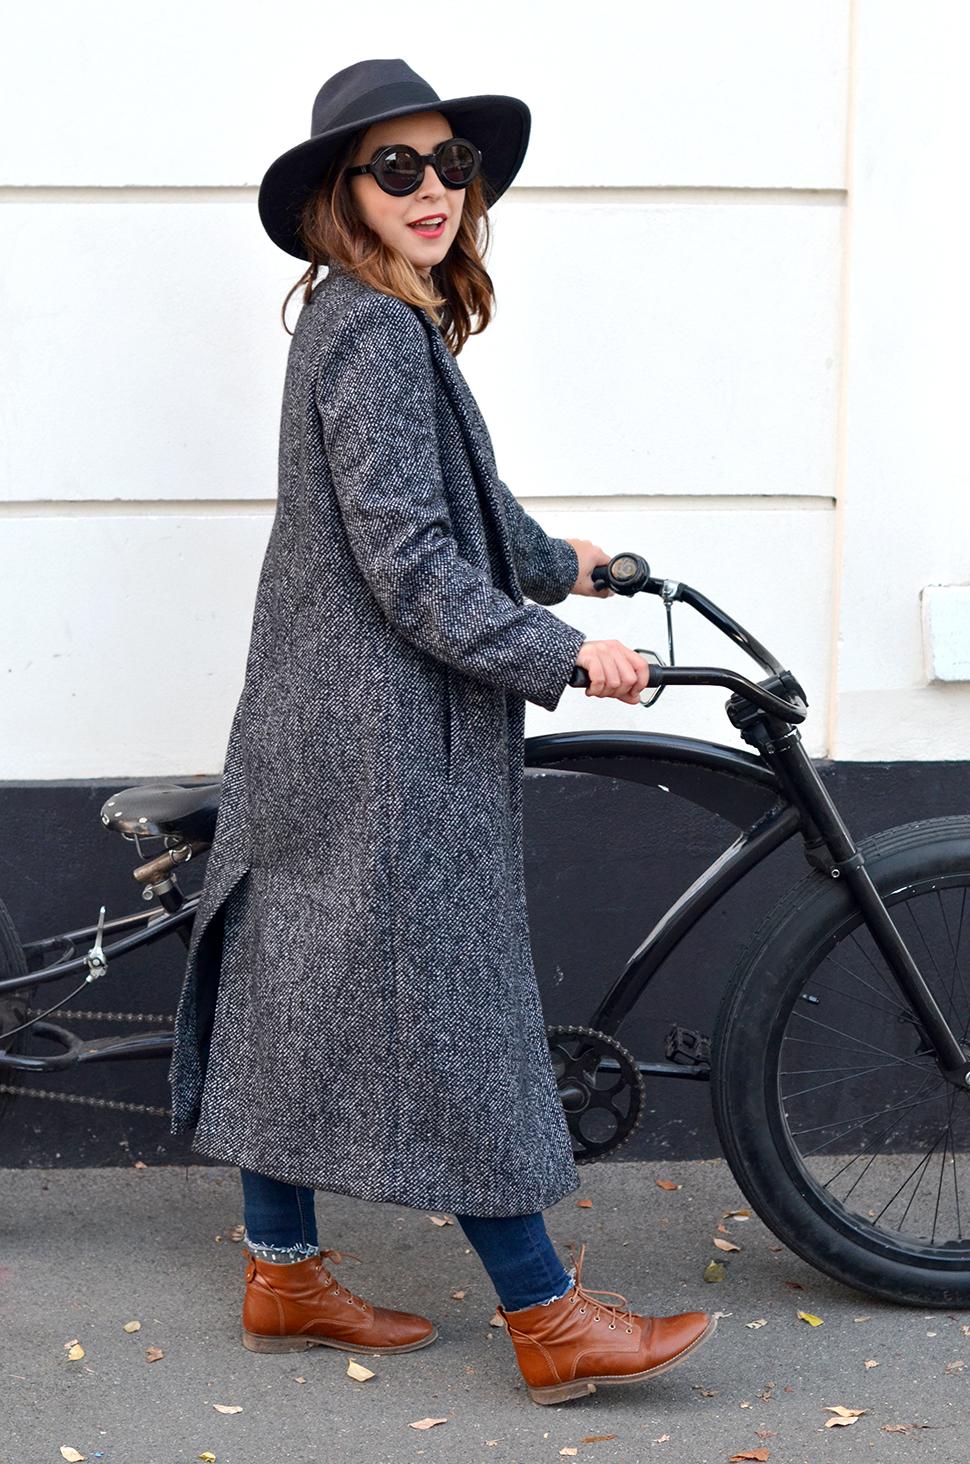 Helloitsvalentine_bikes_4